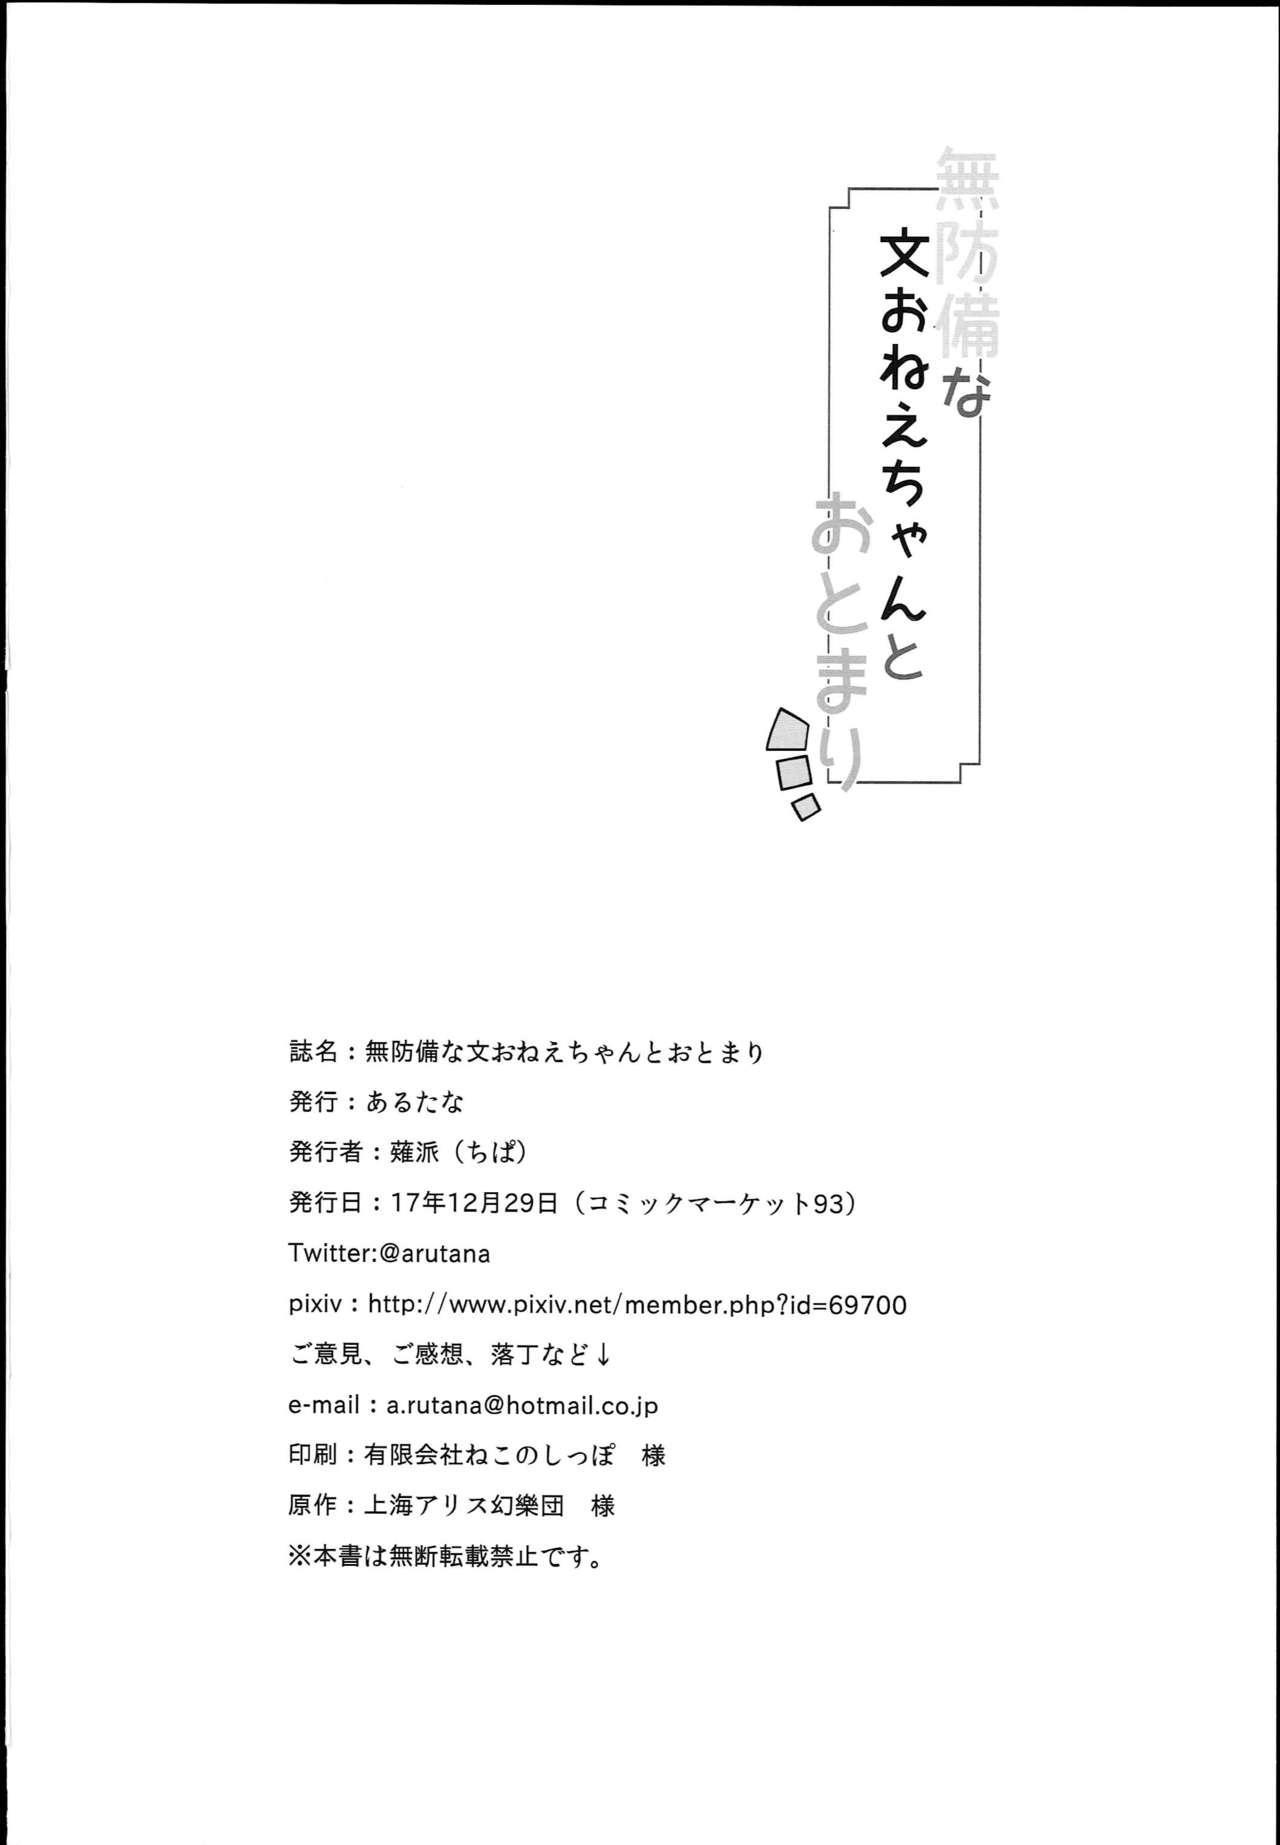 Muboubi na Aya Onee-chan to Otomari 29